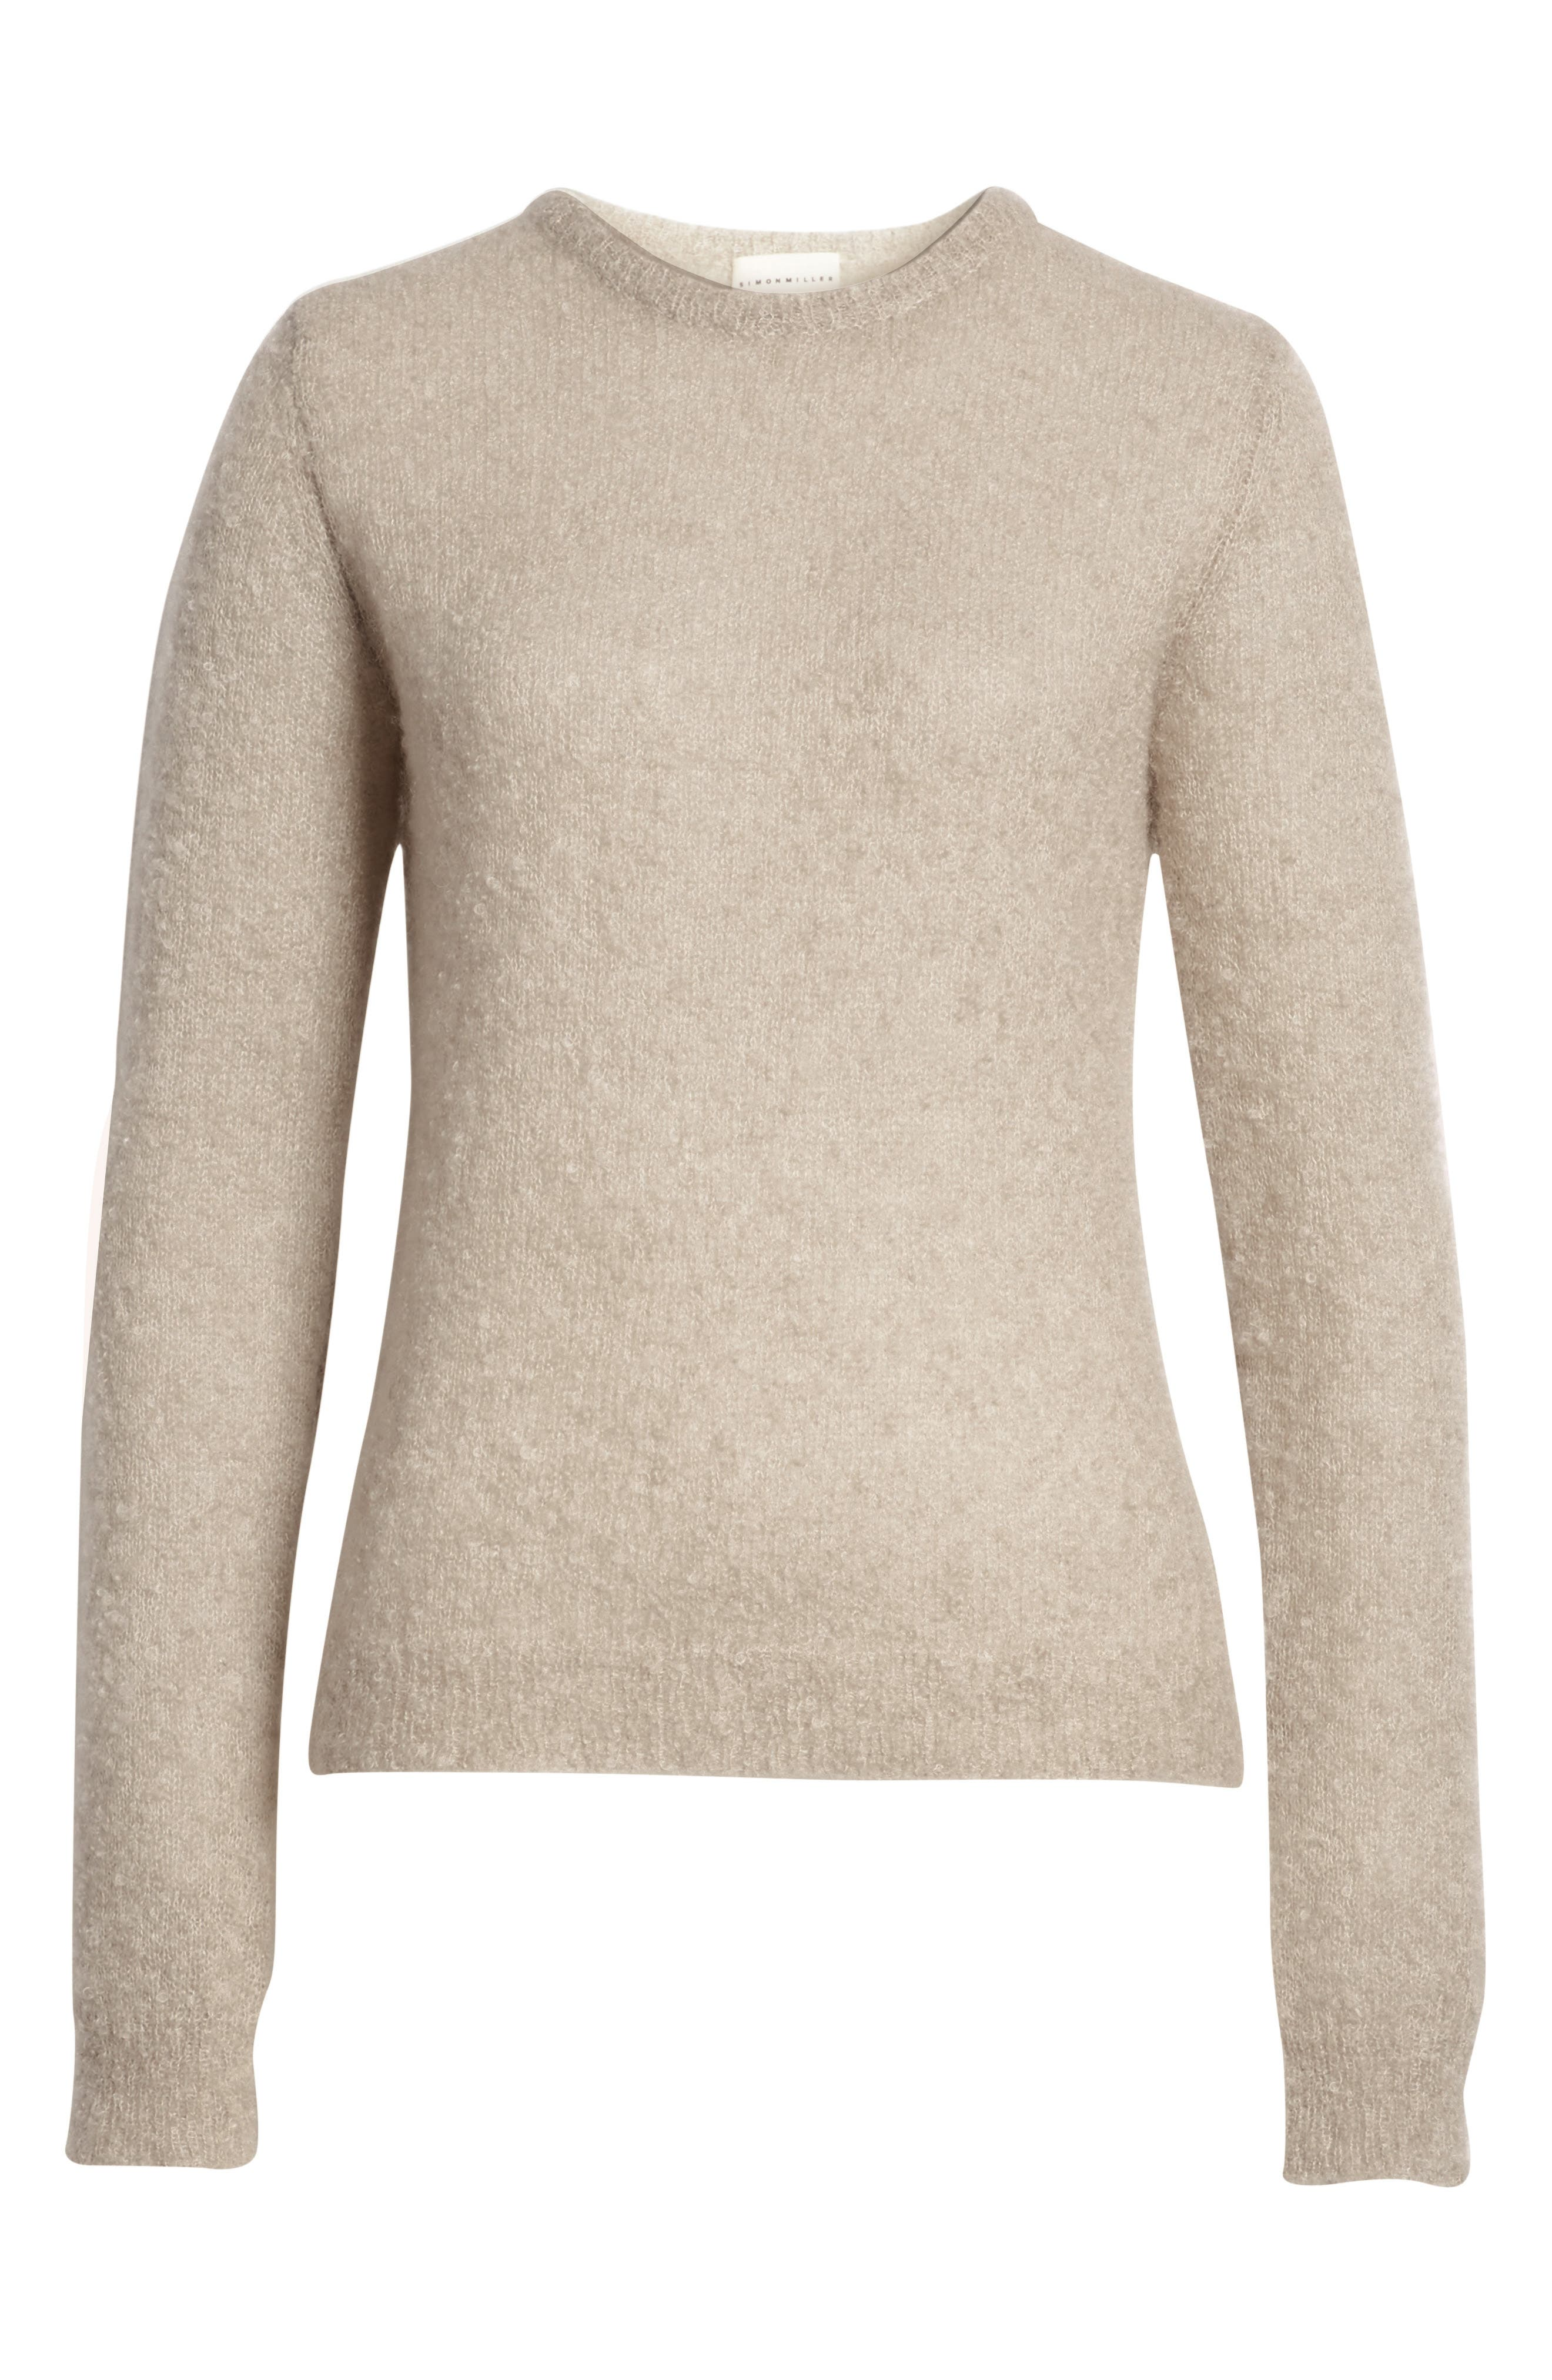 Tatum Mohair & Silk Sweater,                             Alternate thumbnail 6, color,                             020